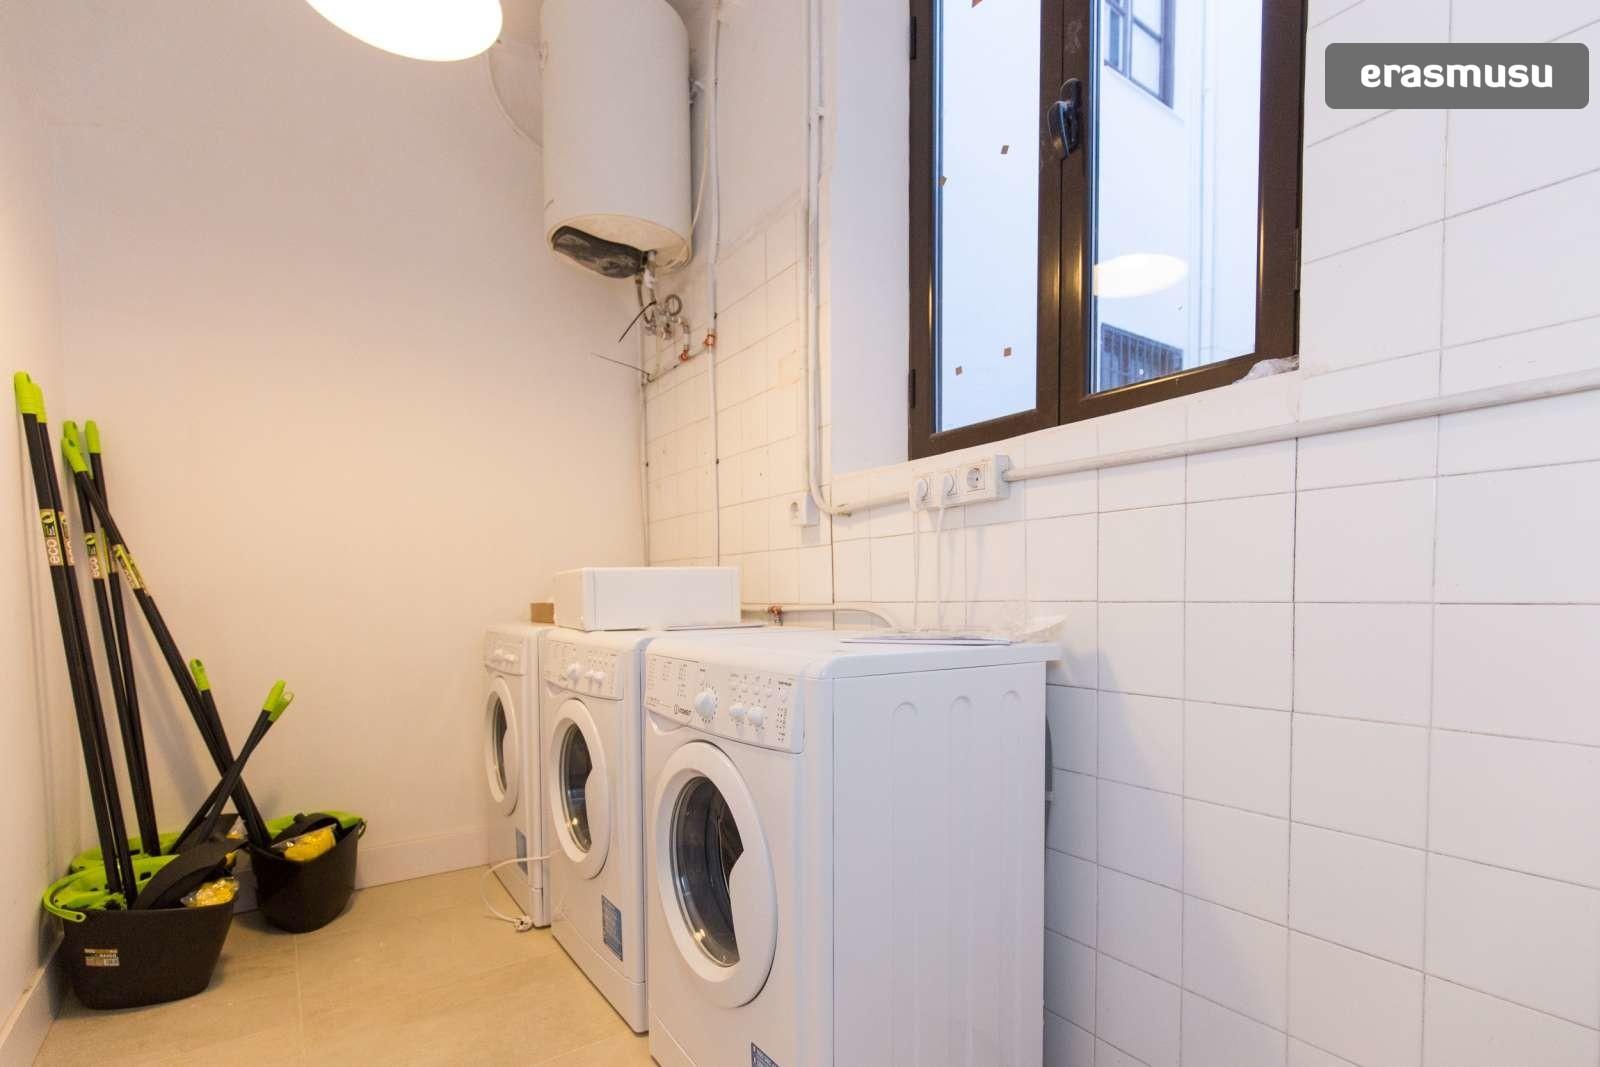 colourful-studio-apartment-rent-city-centre-ff41d5fee74913434635